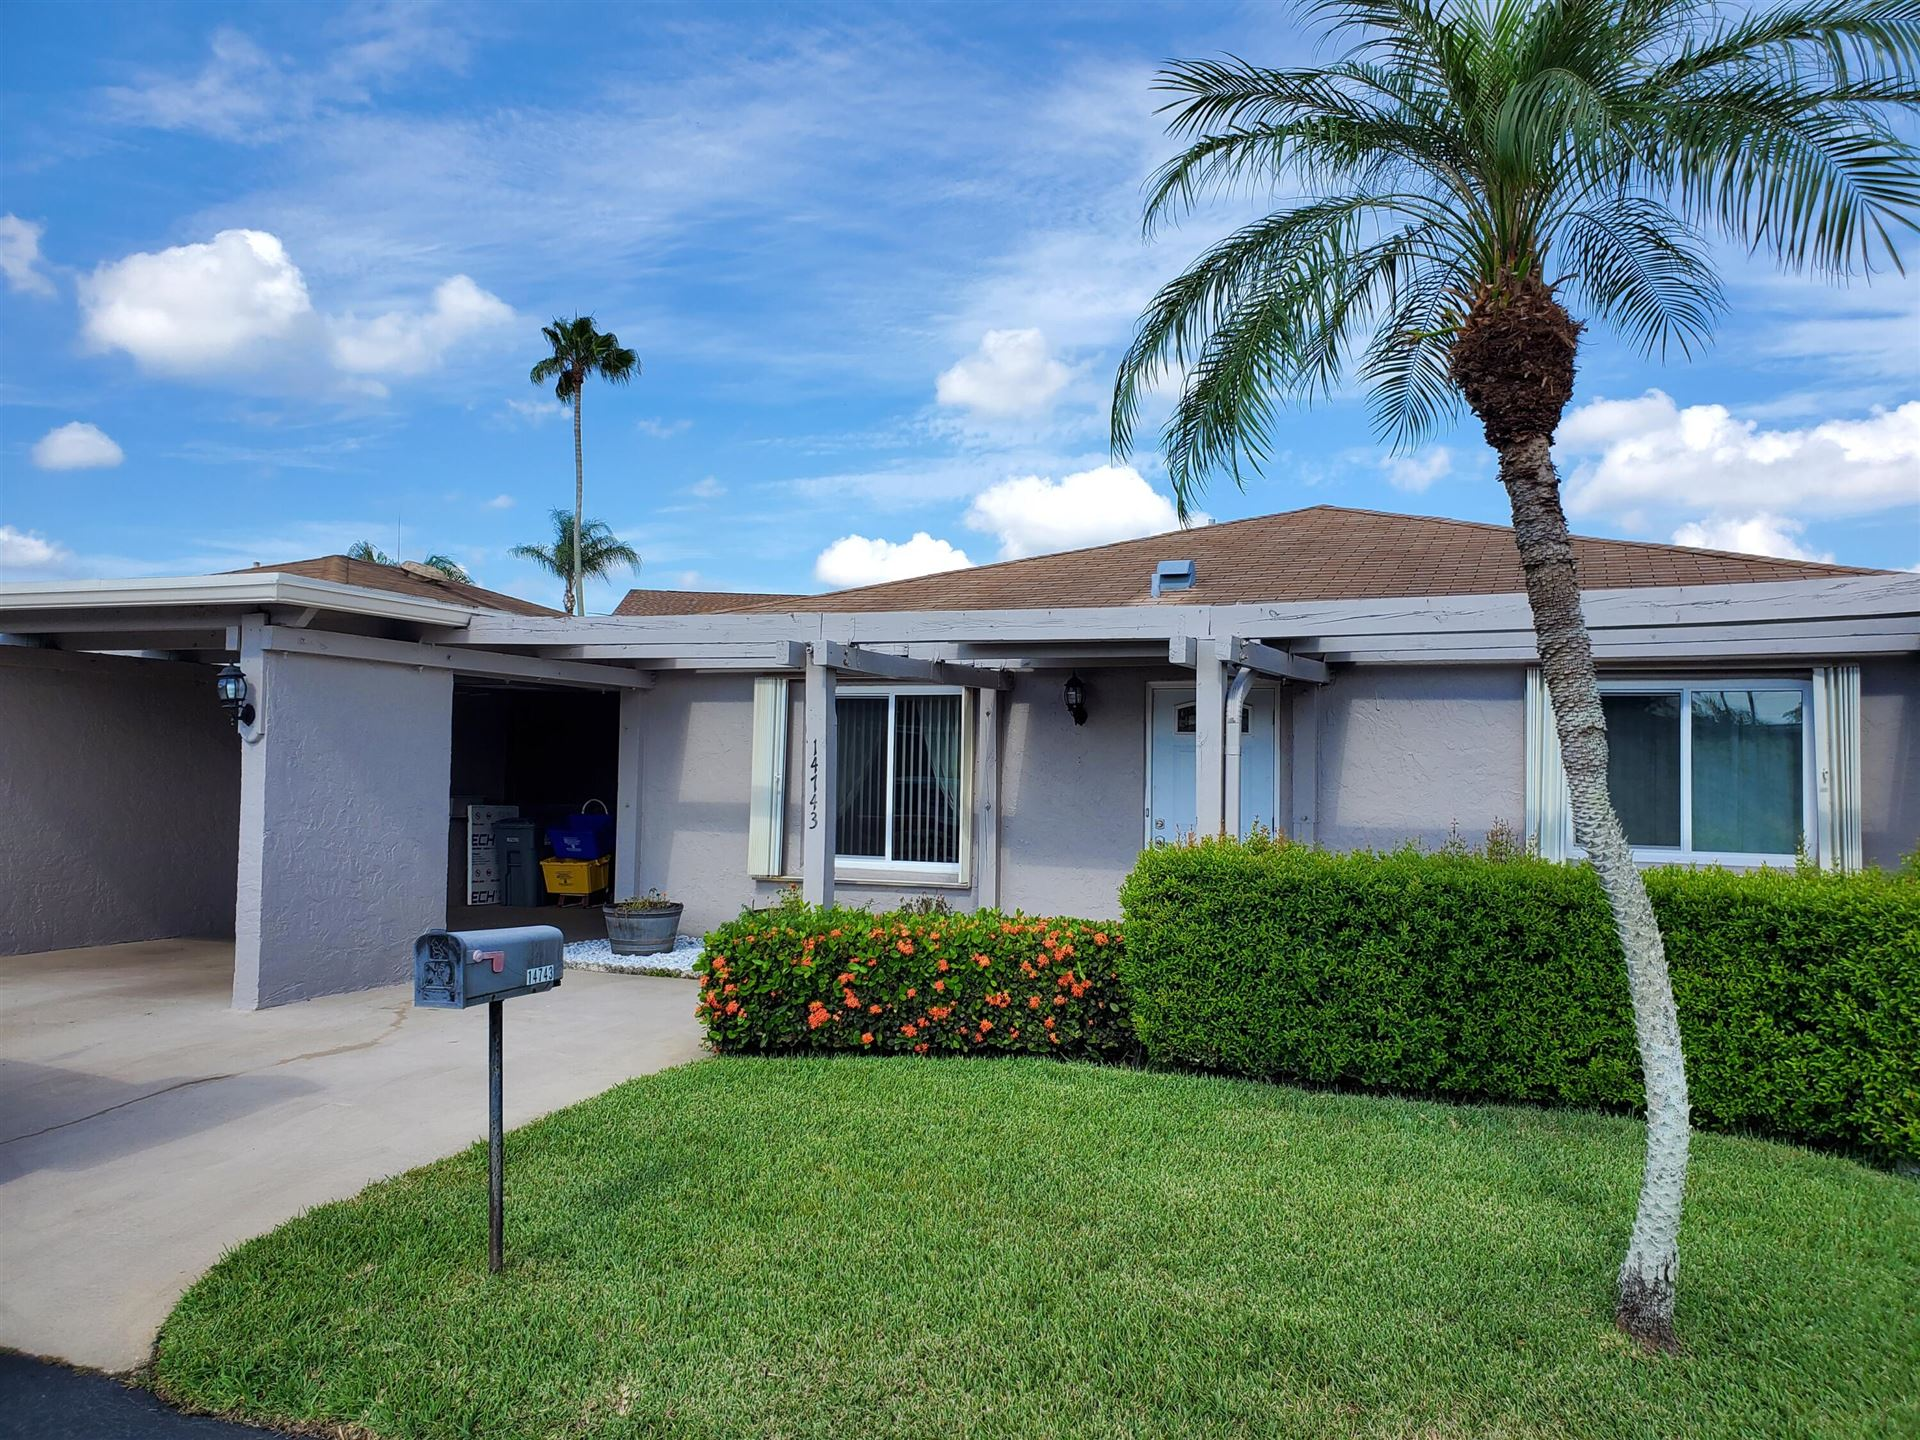 14743 Wildflower Lane, Delray Beach, FL 33446 - MLS#: RX-10720808